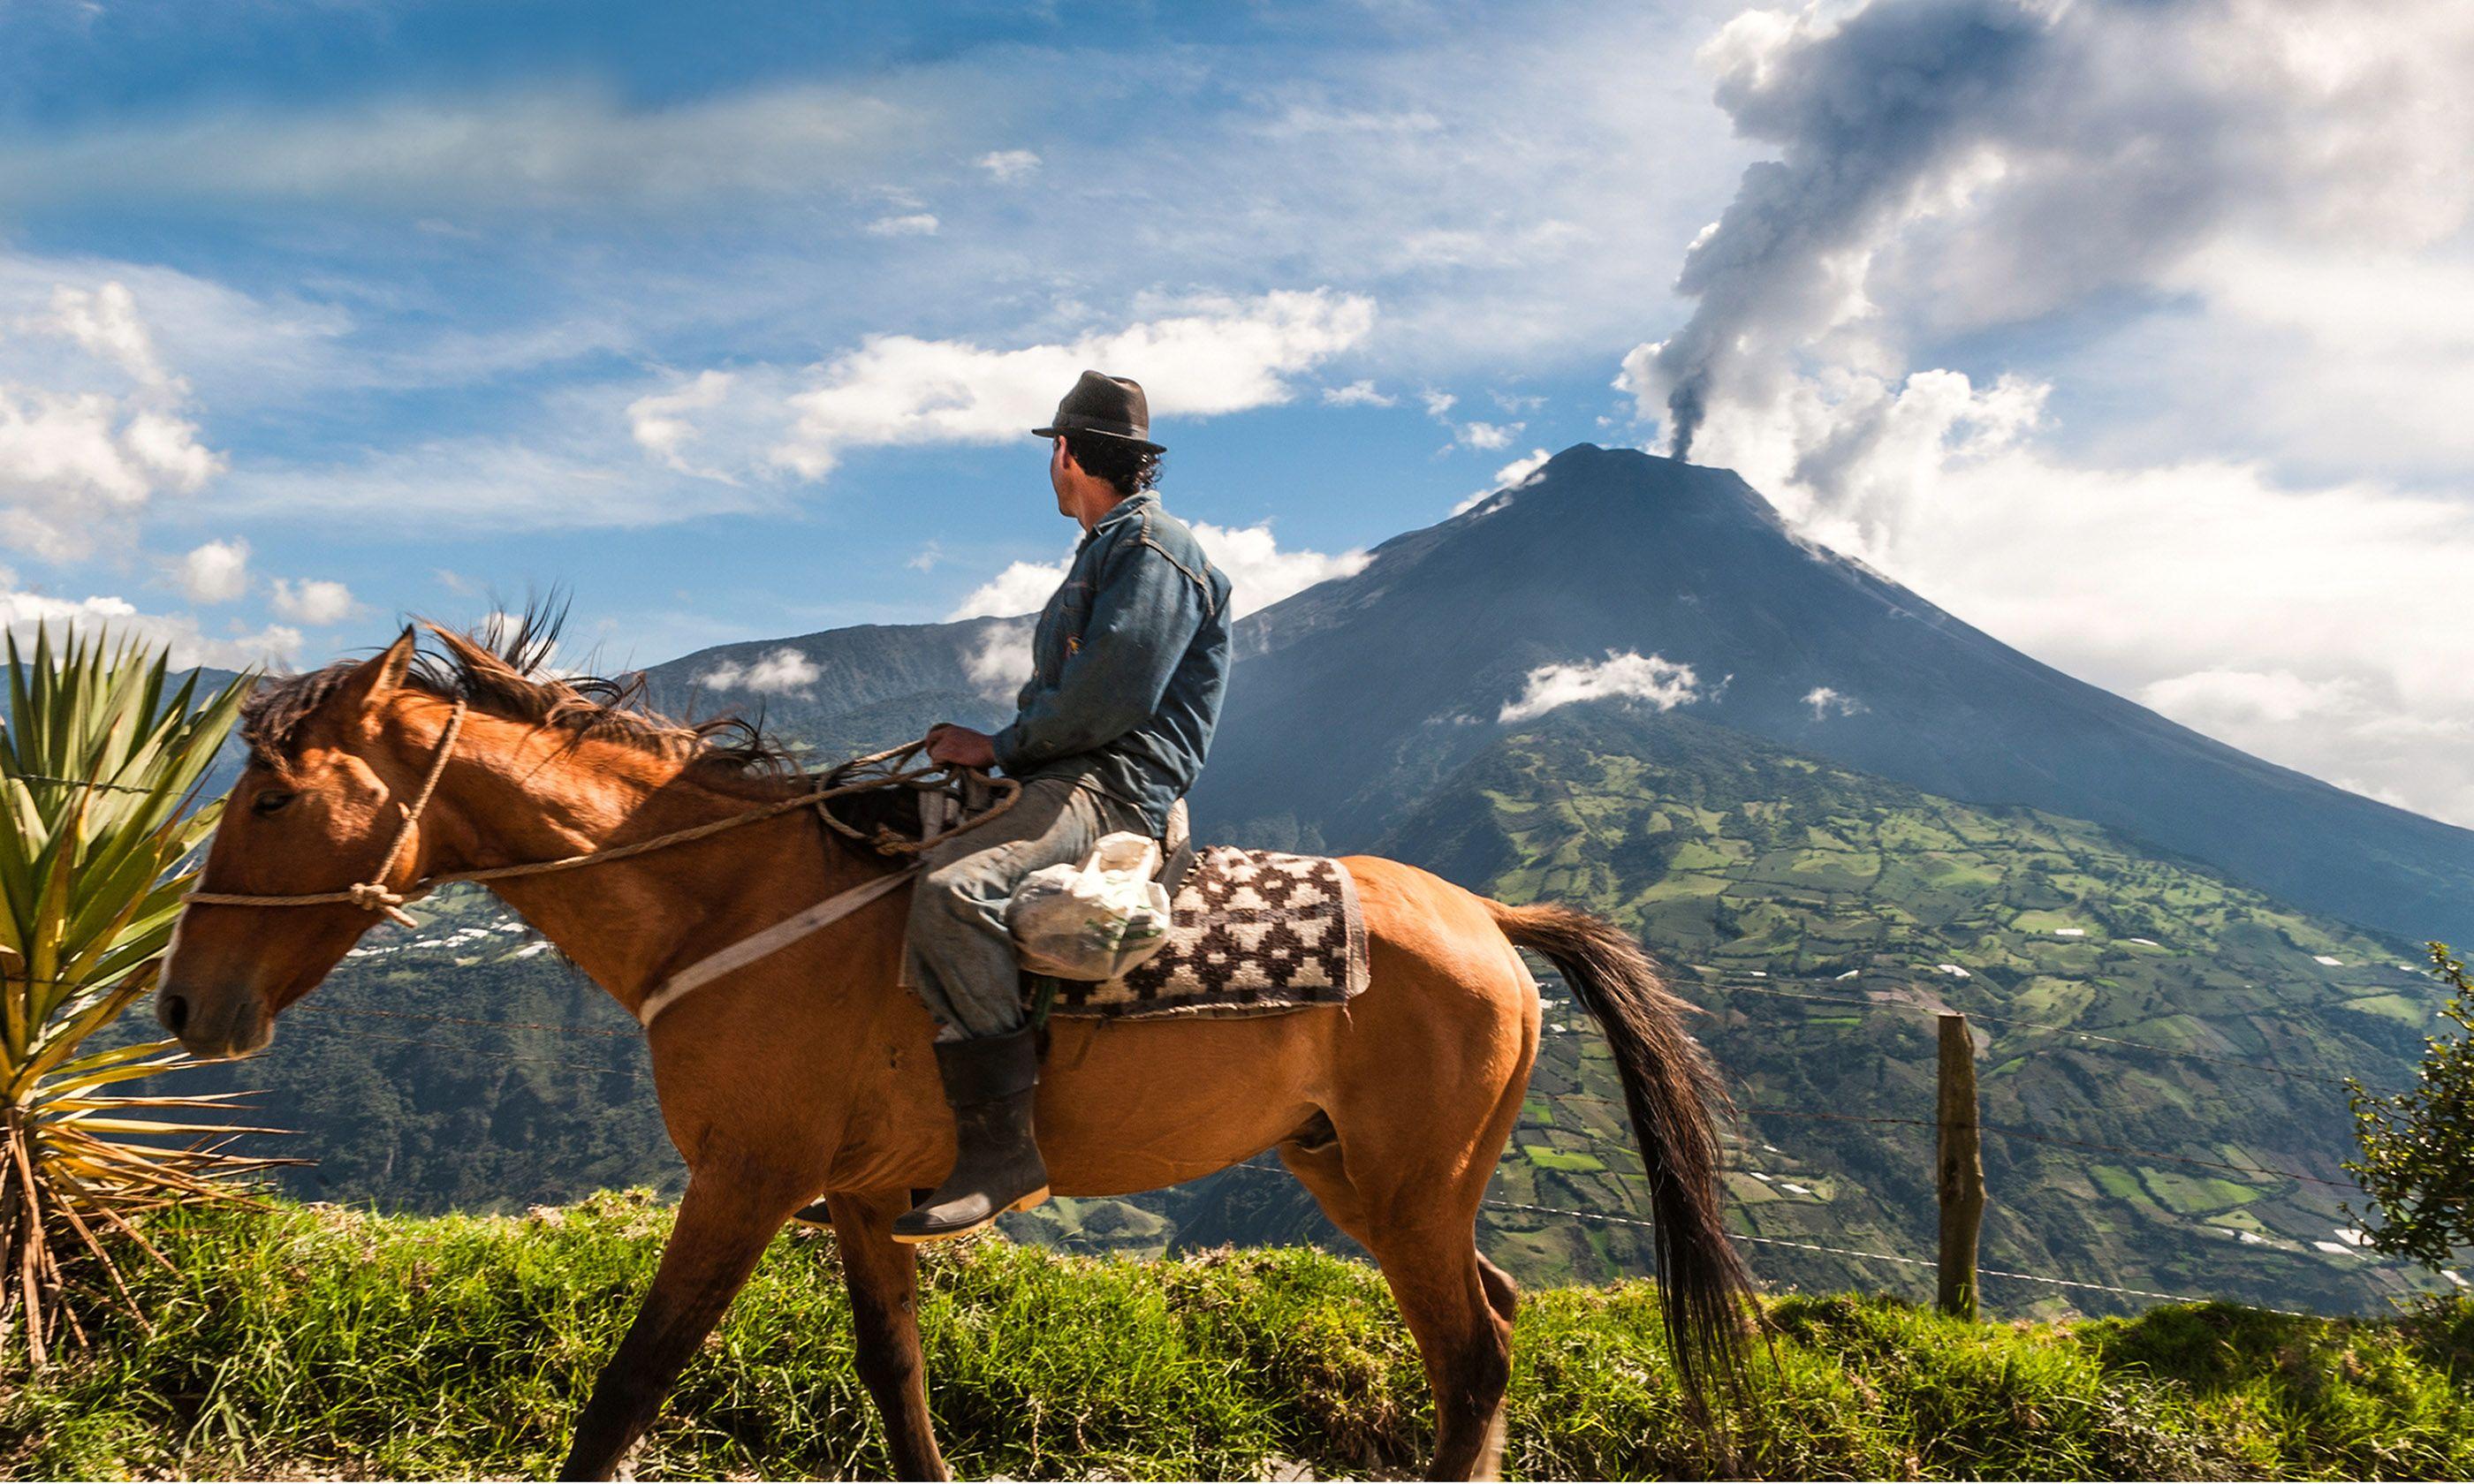 Farmer on horseback watching volcano erupt (Shutterstock.com)